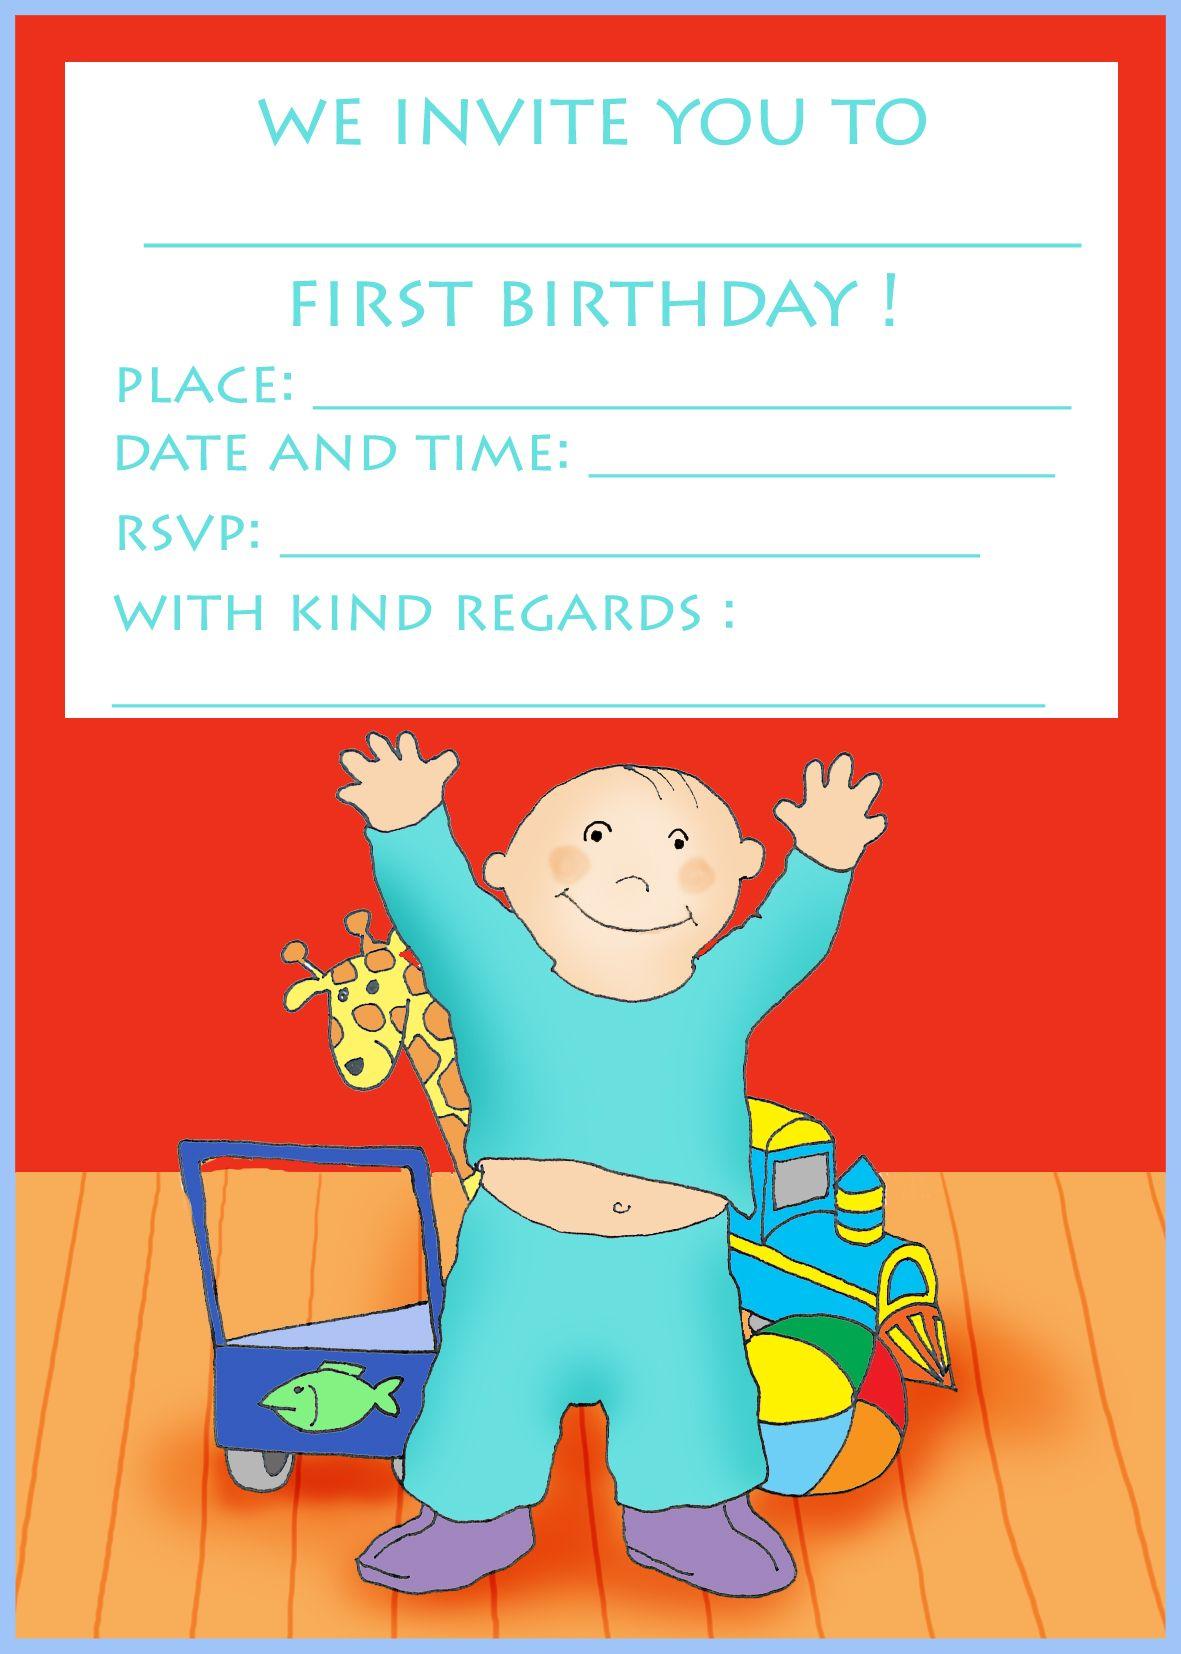 Free Printable Birthday Cards Boy Happy With Toys | Kids Party Food - Free Printable Kids Birthday Cards Boys